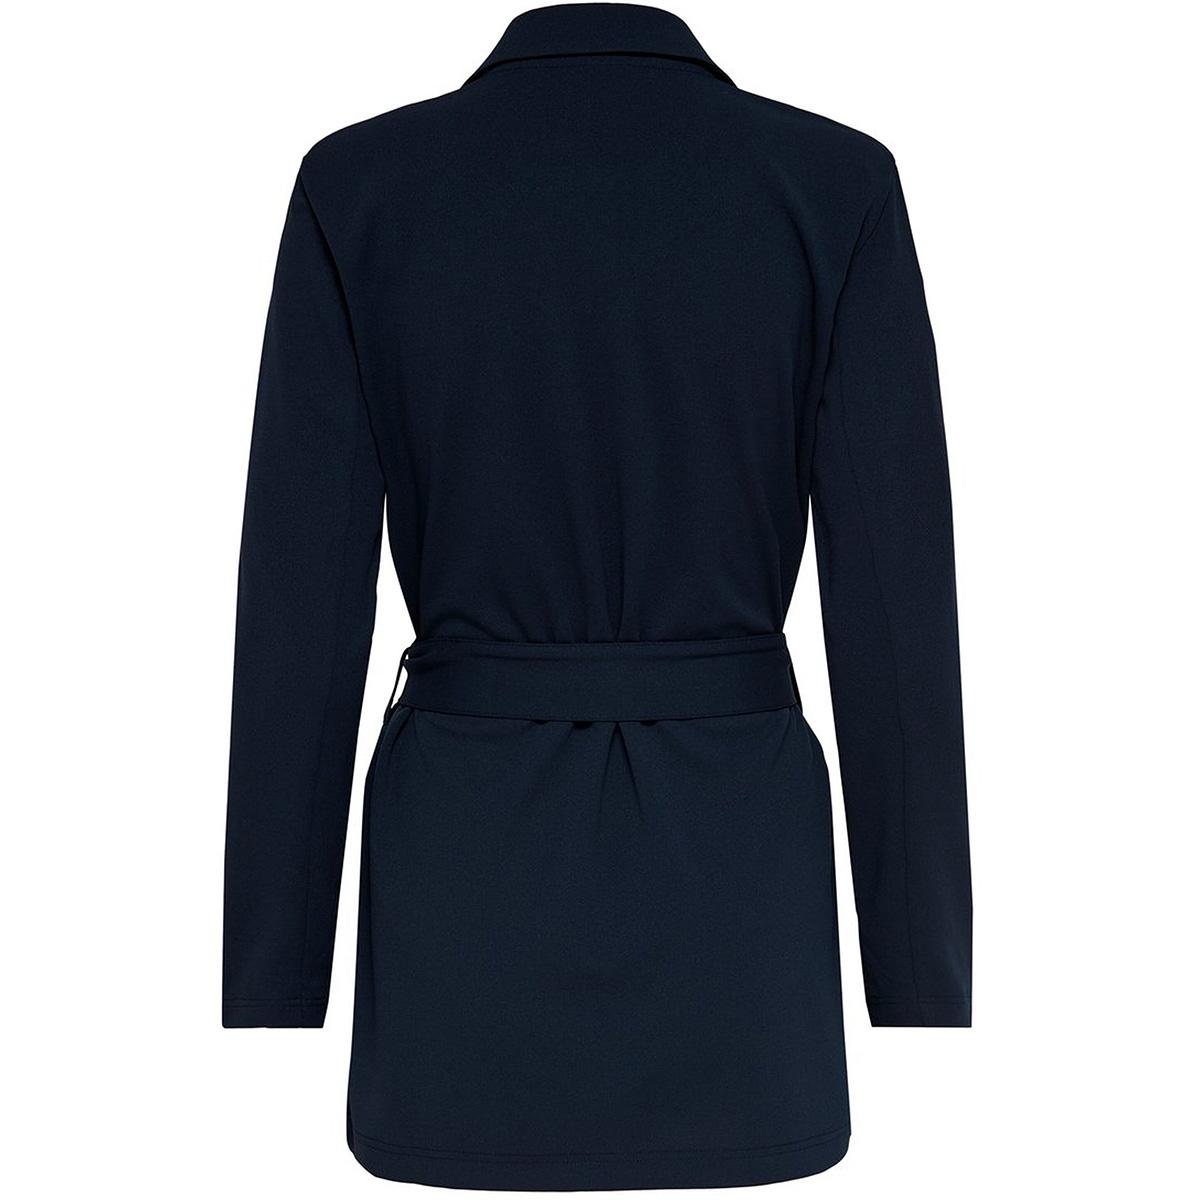 jdyone catia treats l/s blazer jrs 15196959 jacqueline de yong blazer navy blazer